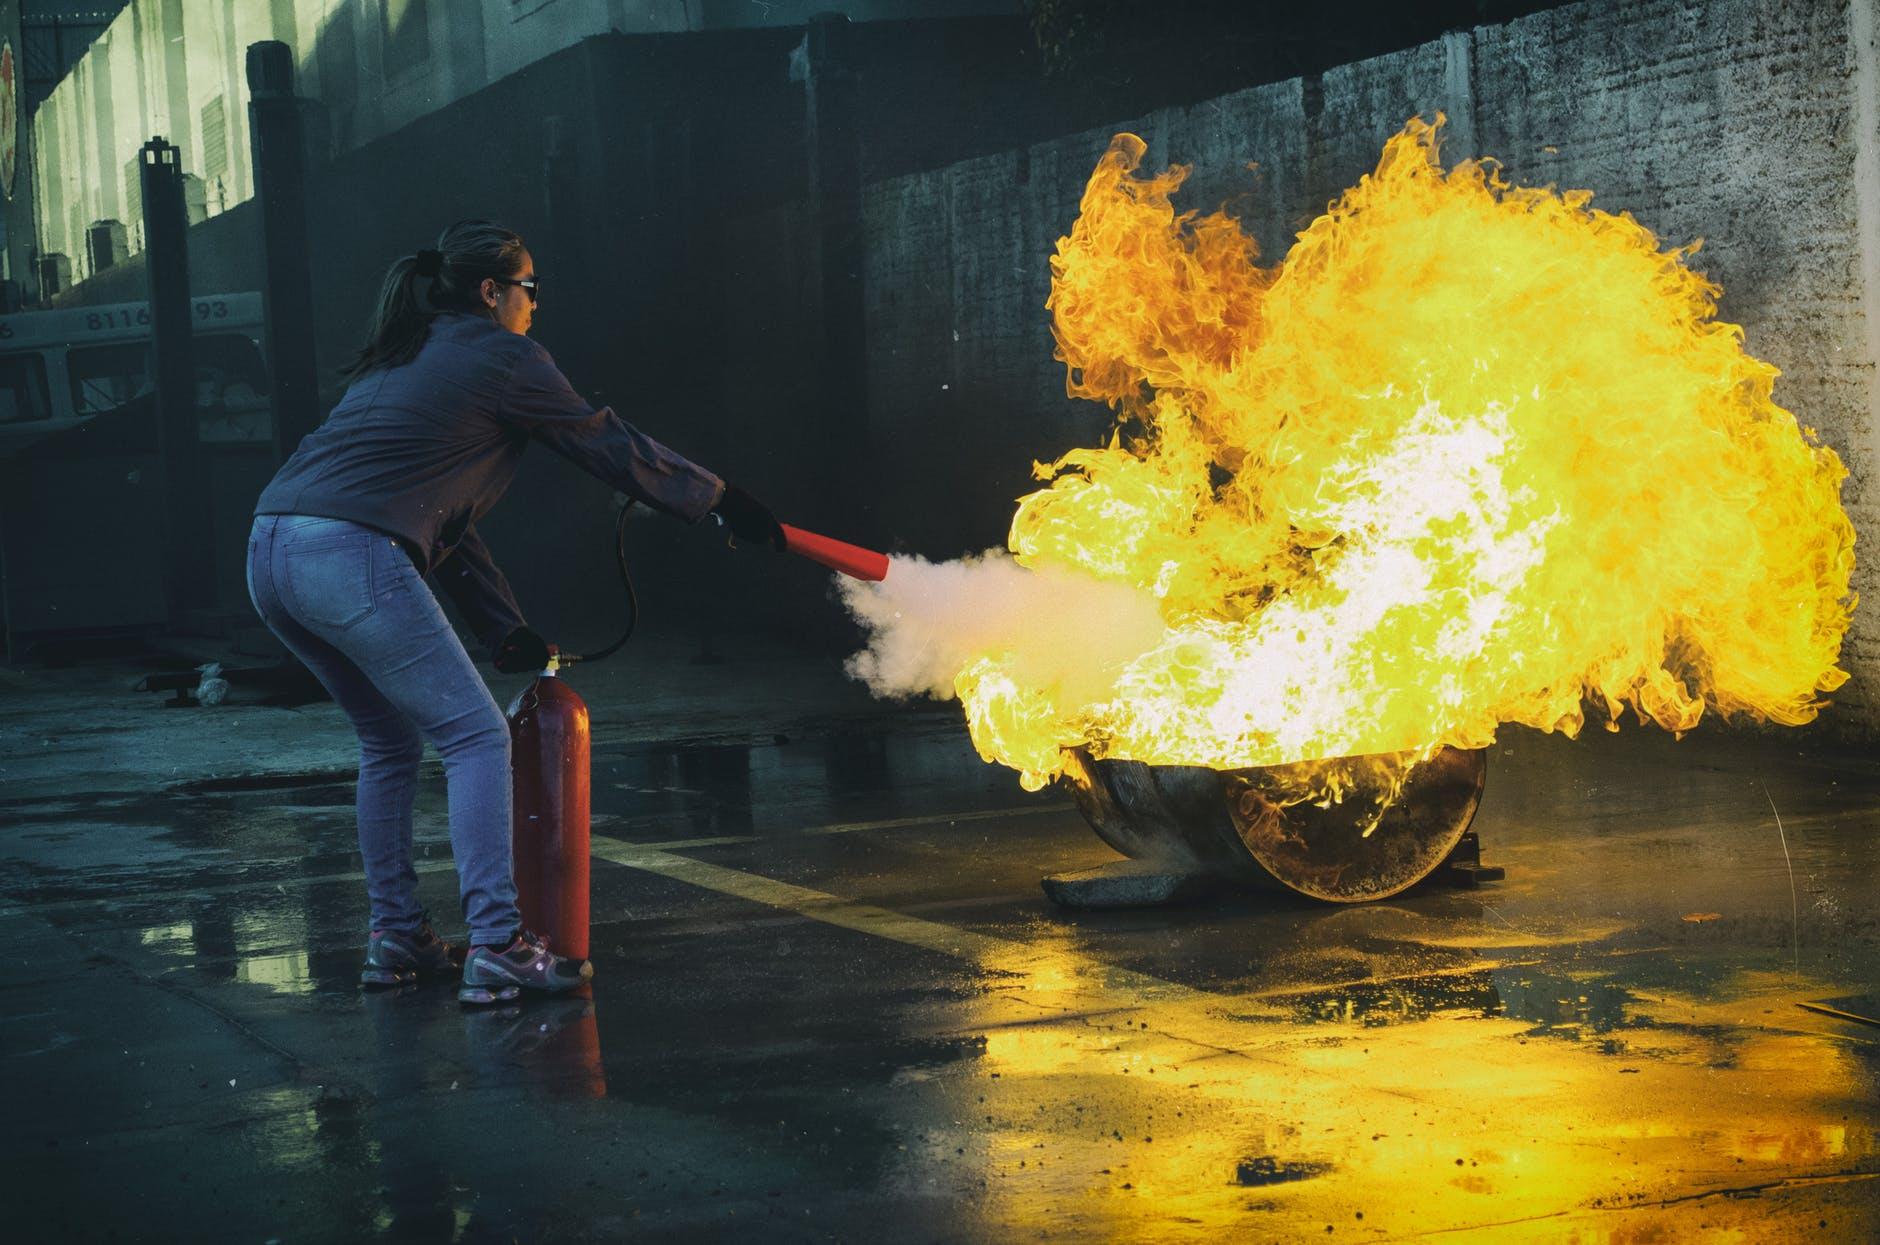 4 Langkah Cara Menggunakan Tabung Pemadam Kebakaran